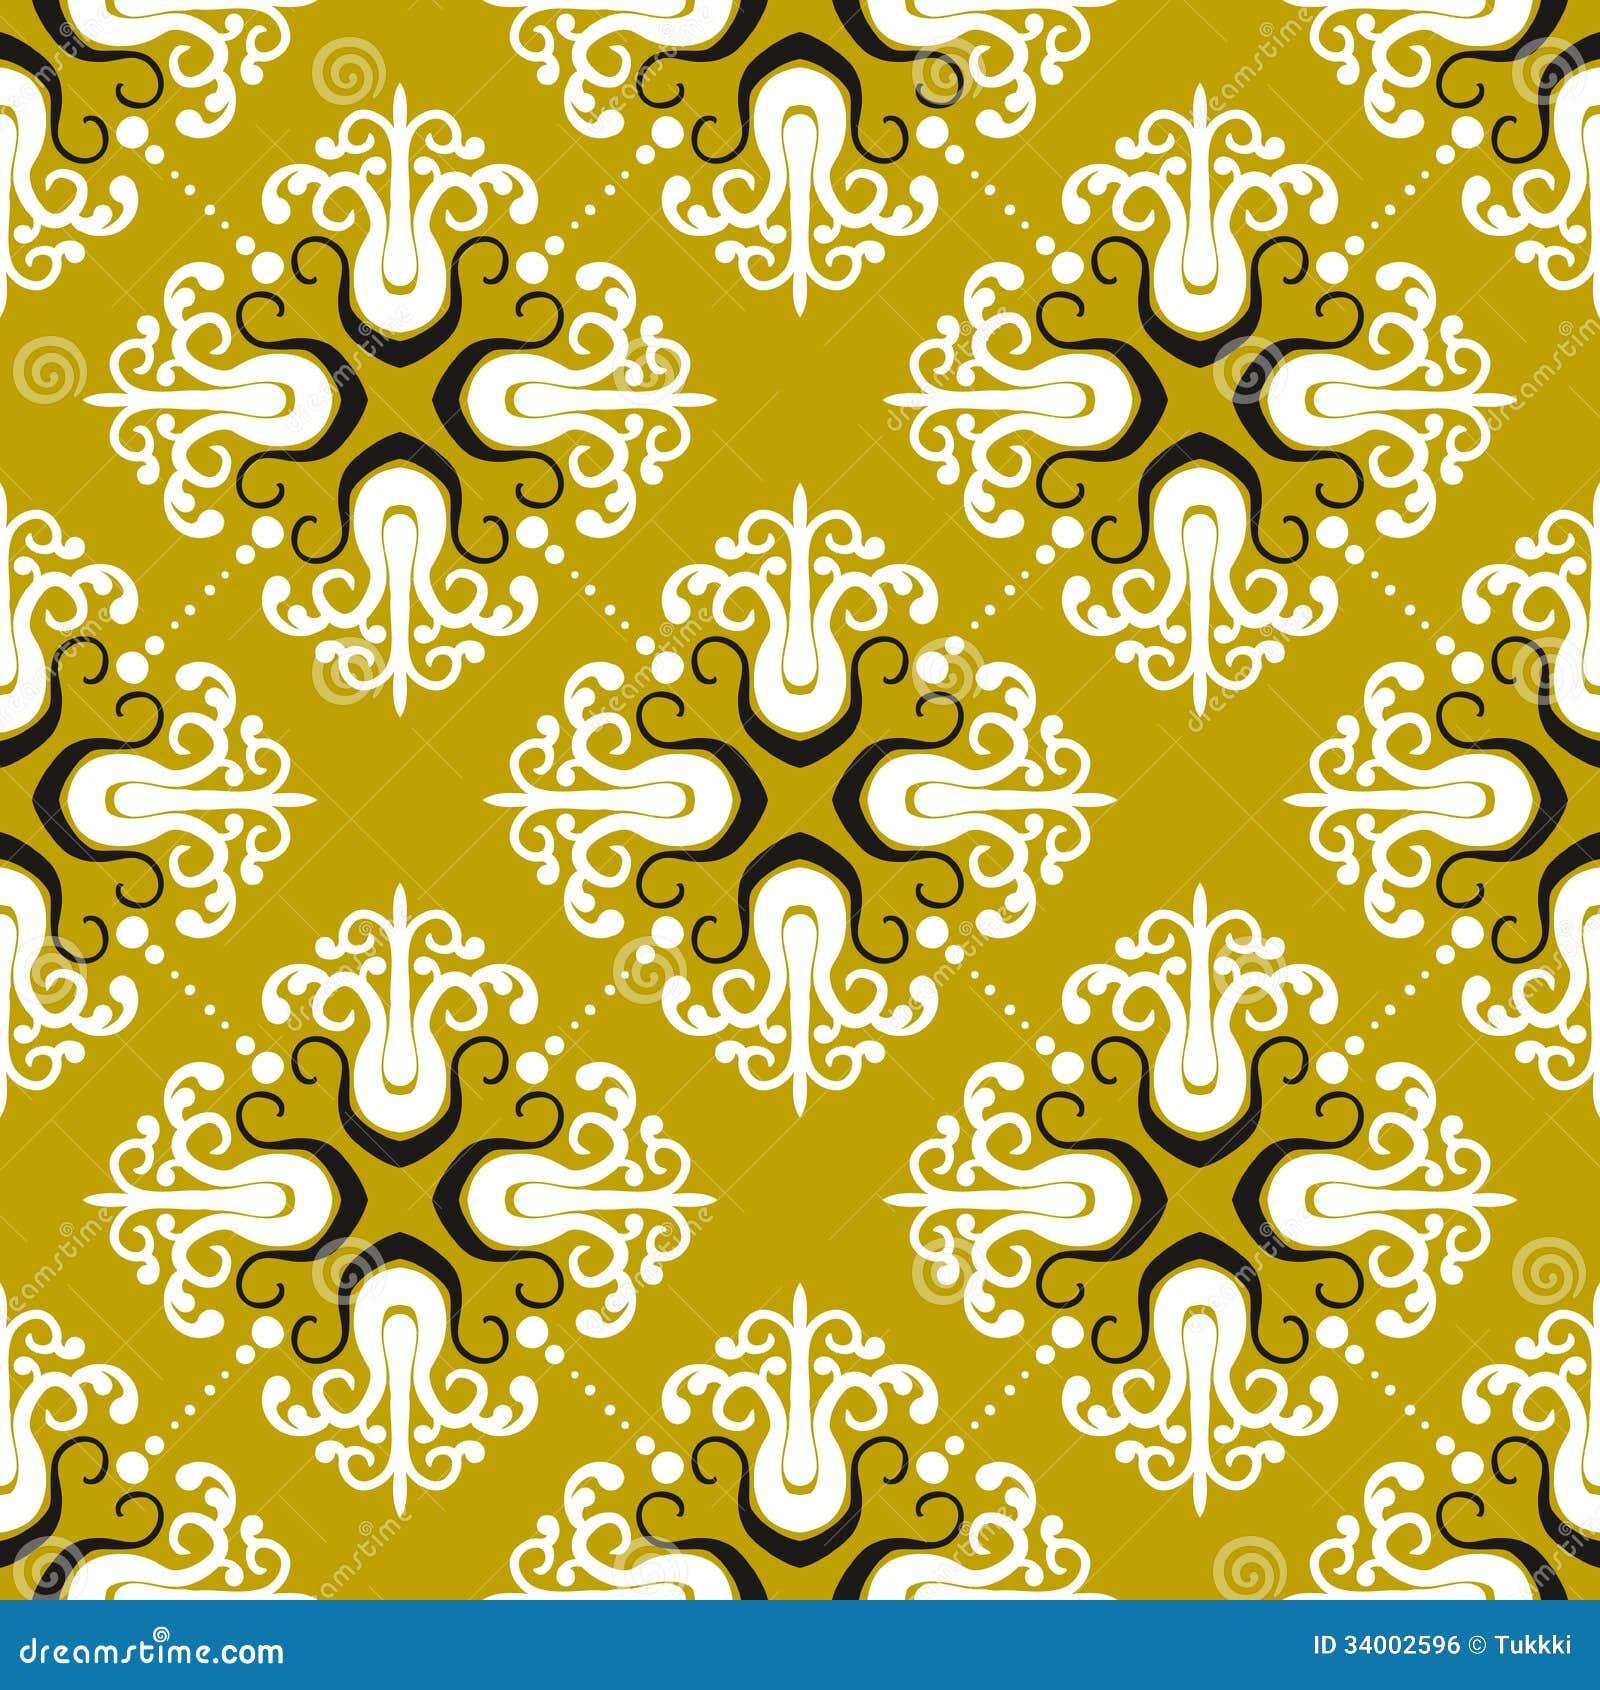 Ornamental Vintage Pattern With Damask Motifs Royalty Free ...